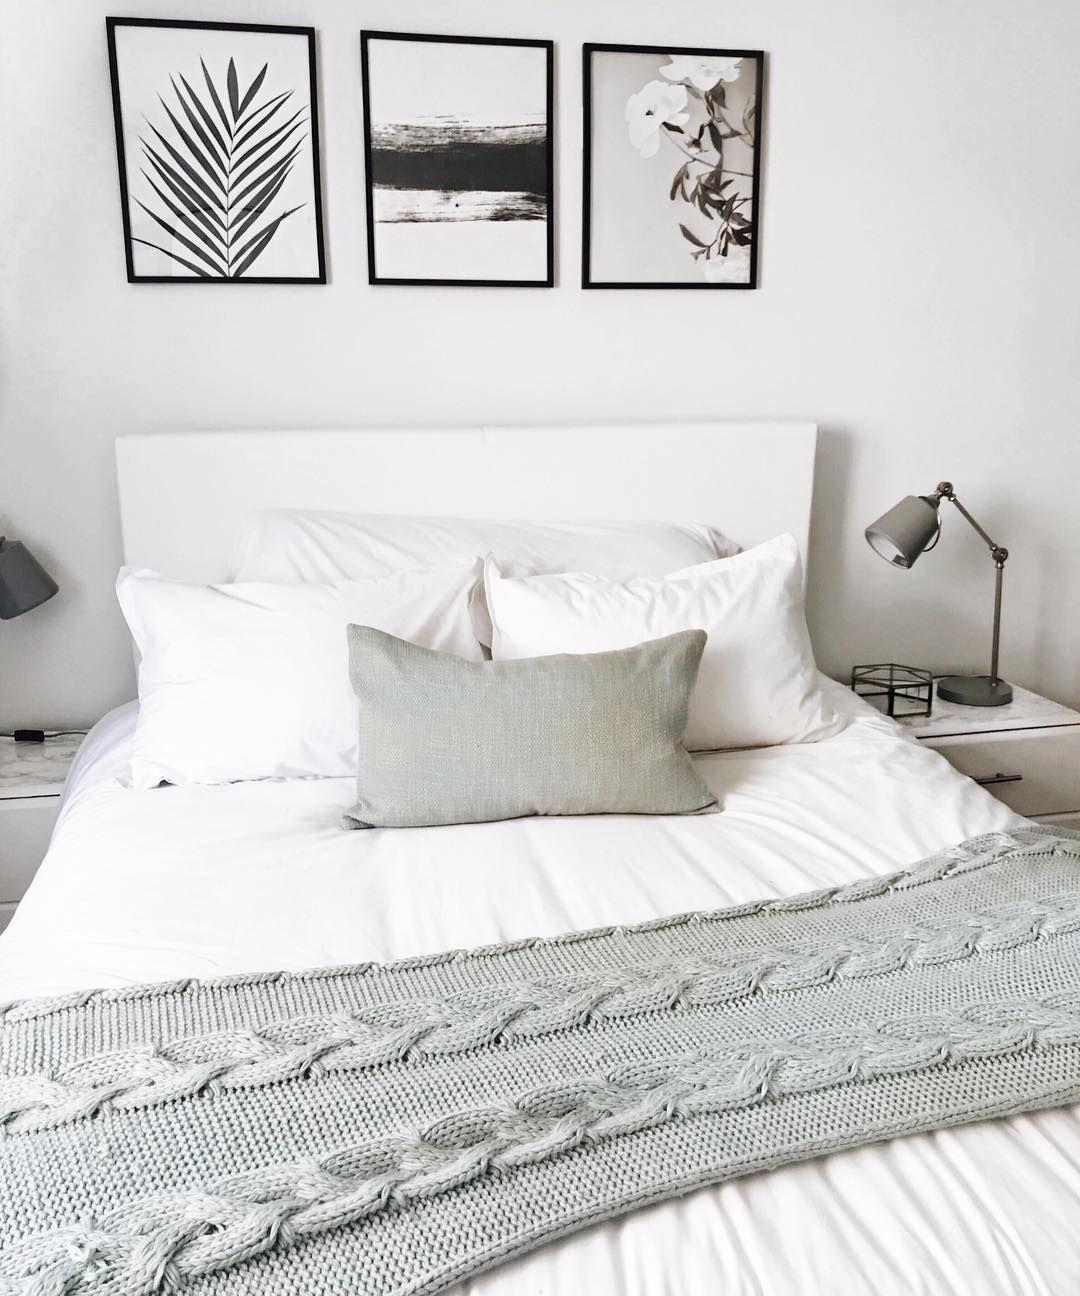 Bedroom decor white and gray decor diy home decor wall art